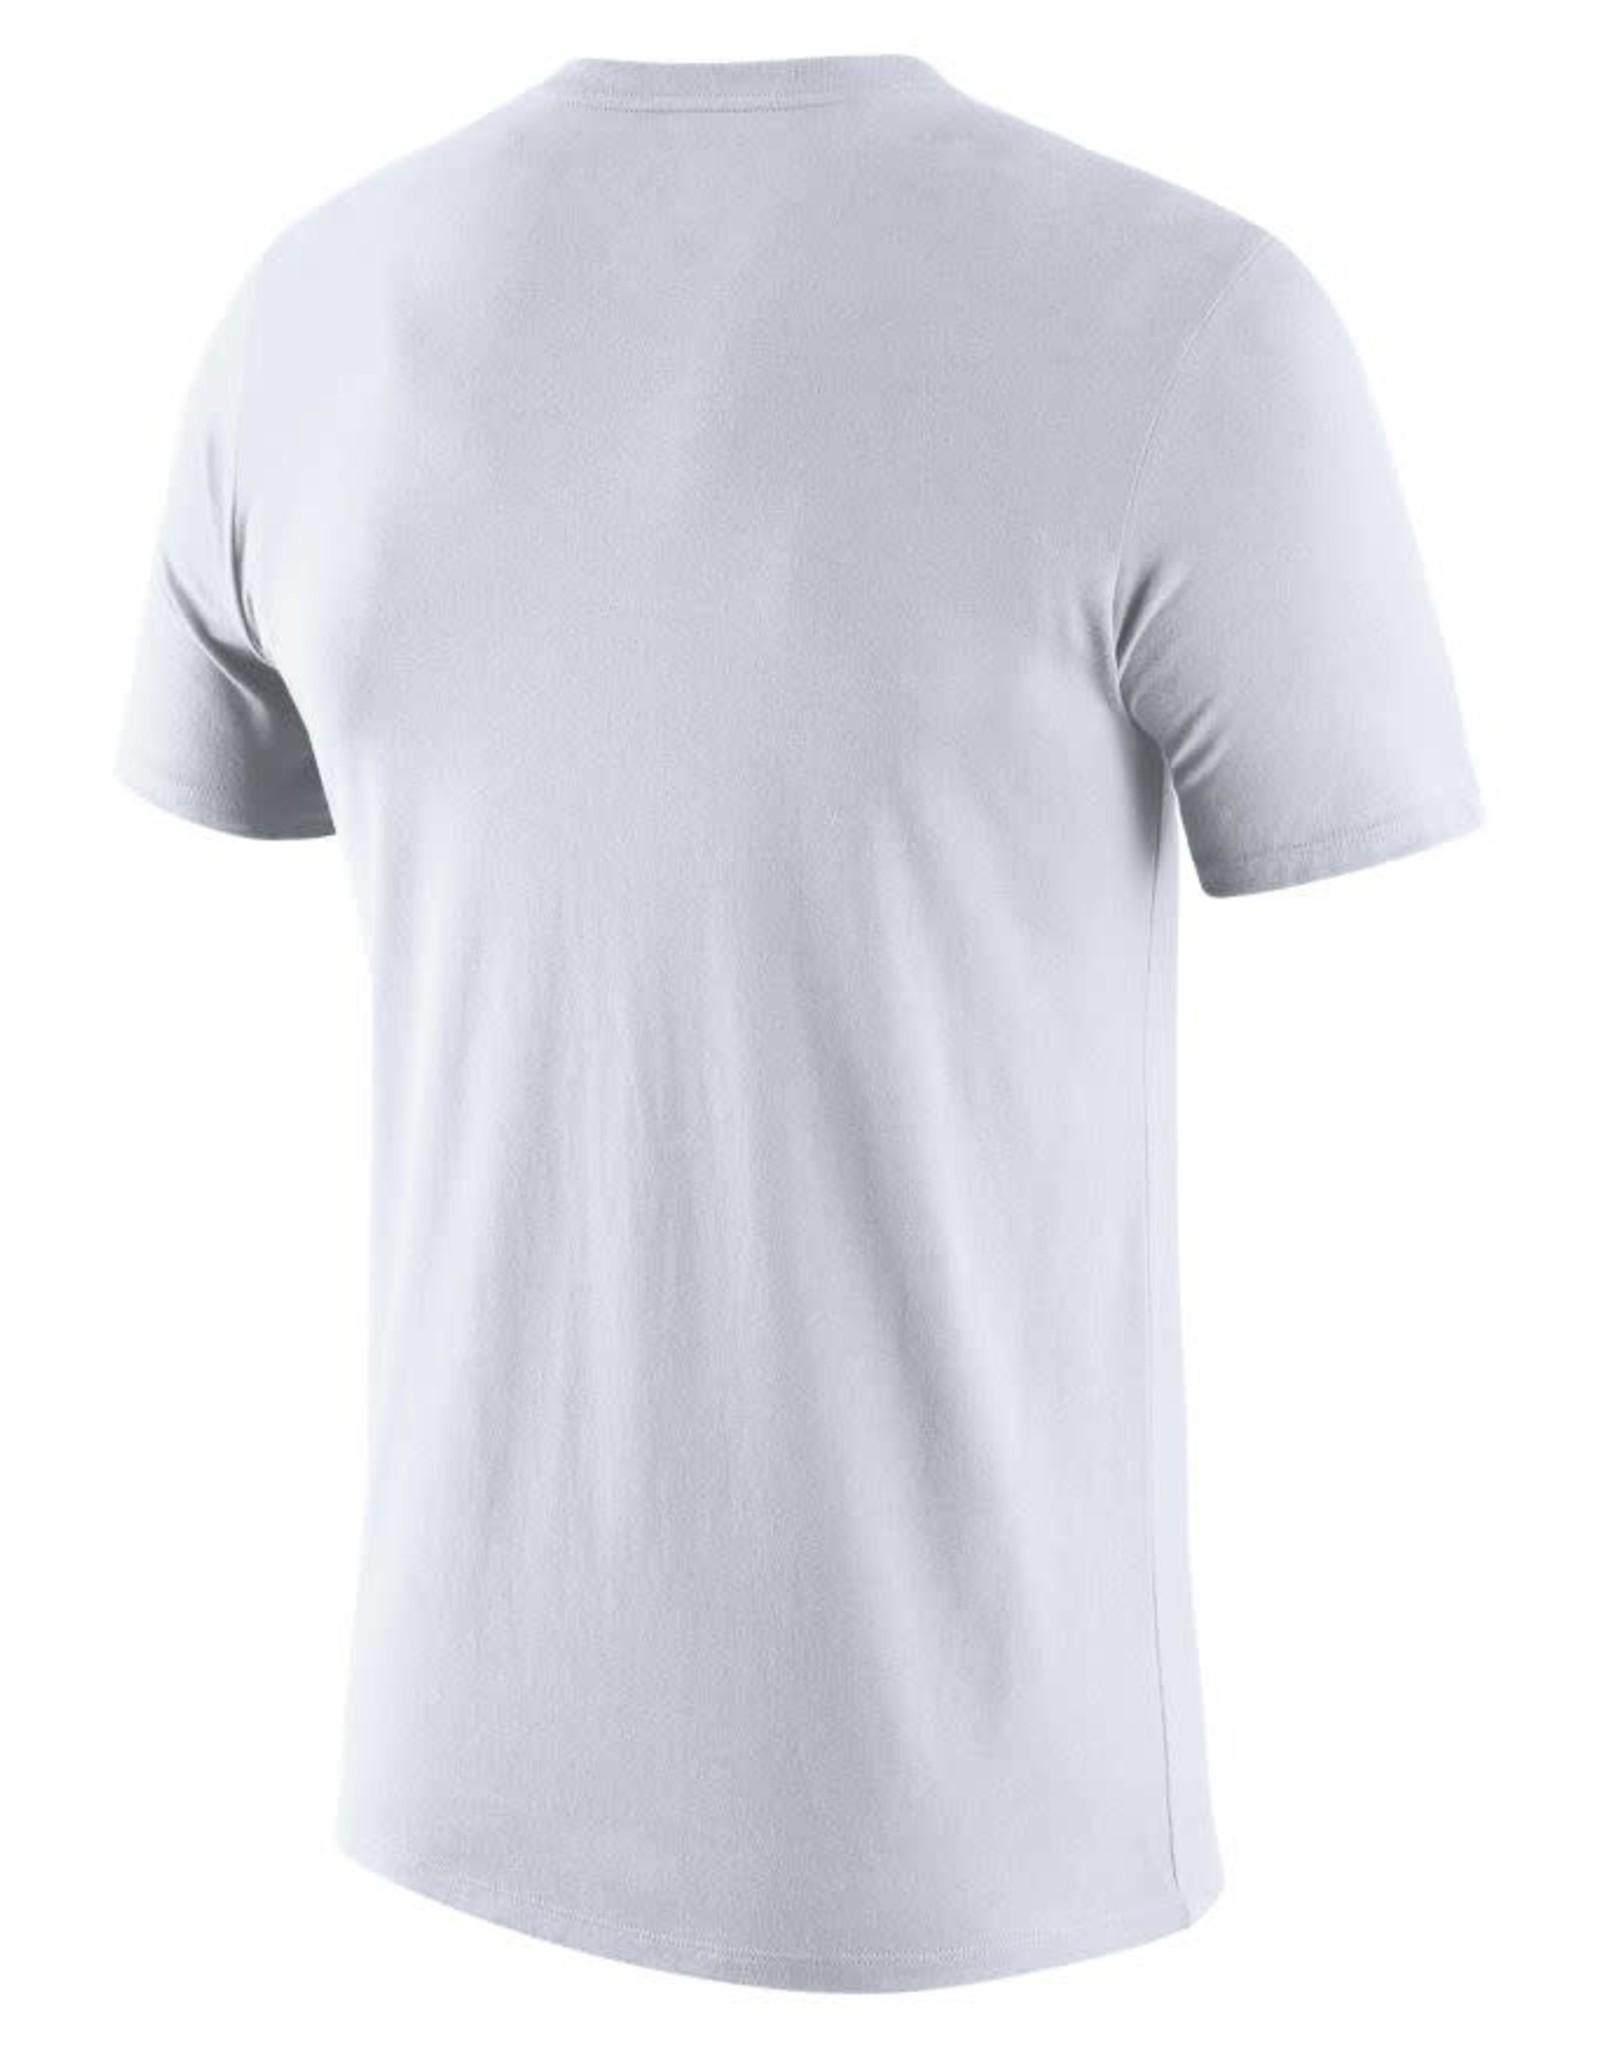 Nike Men's Nike Dri-Fit S/S Legend Logo Tee